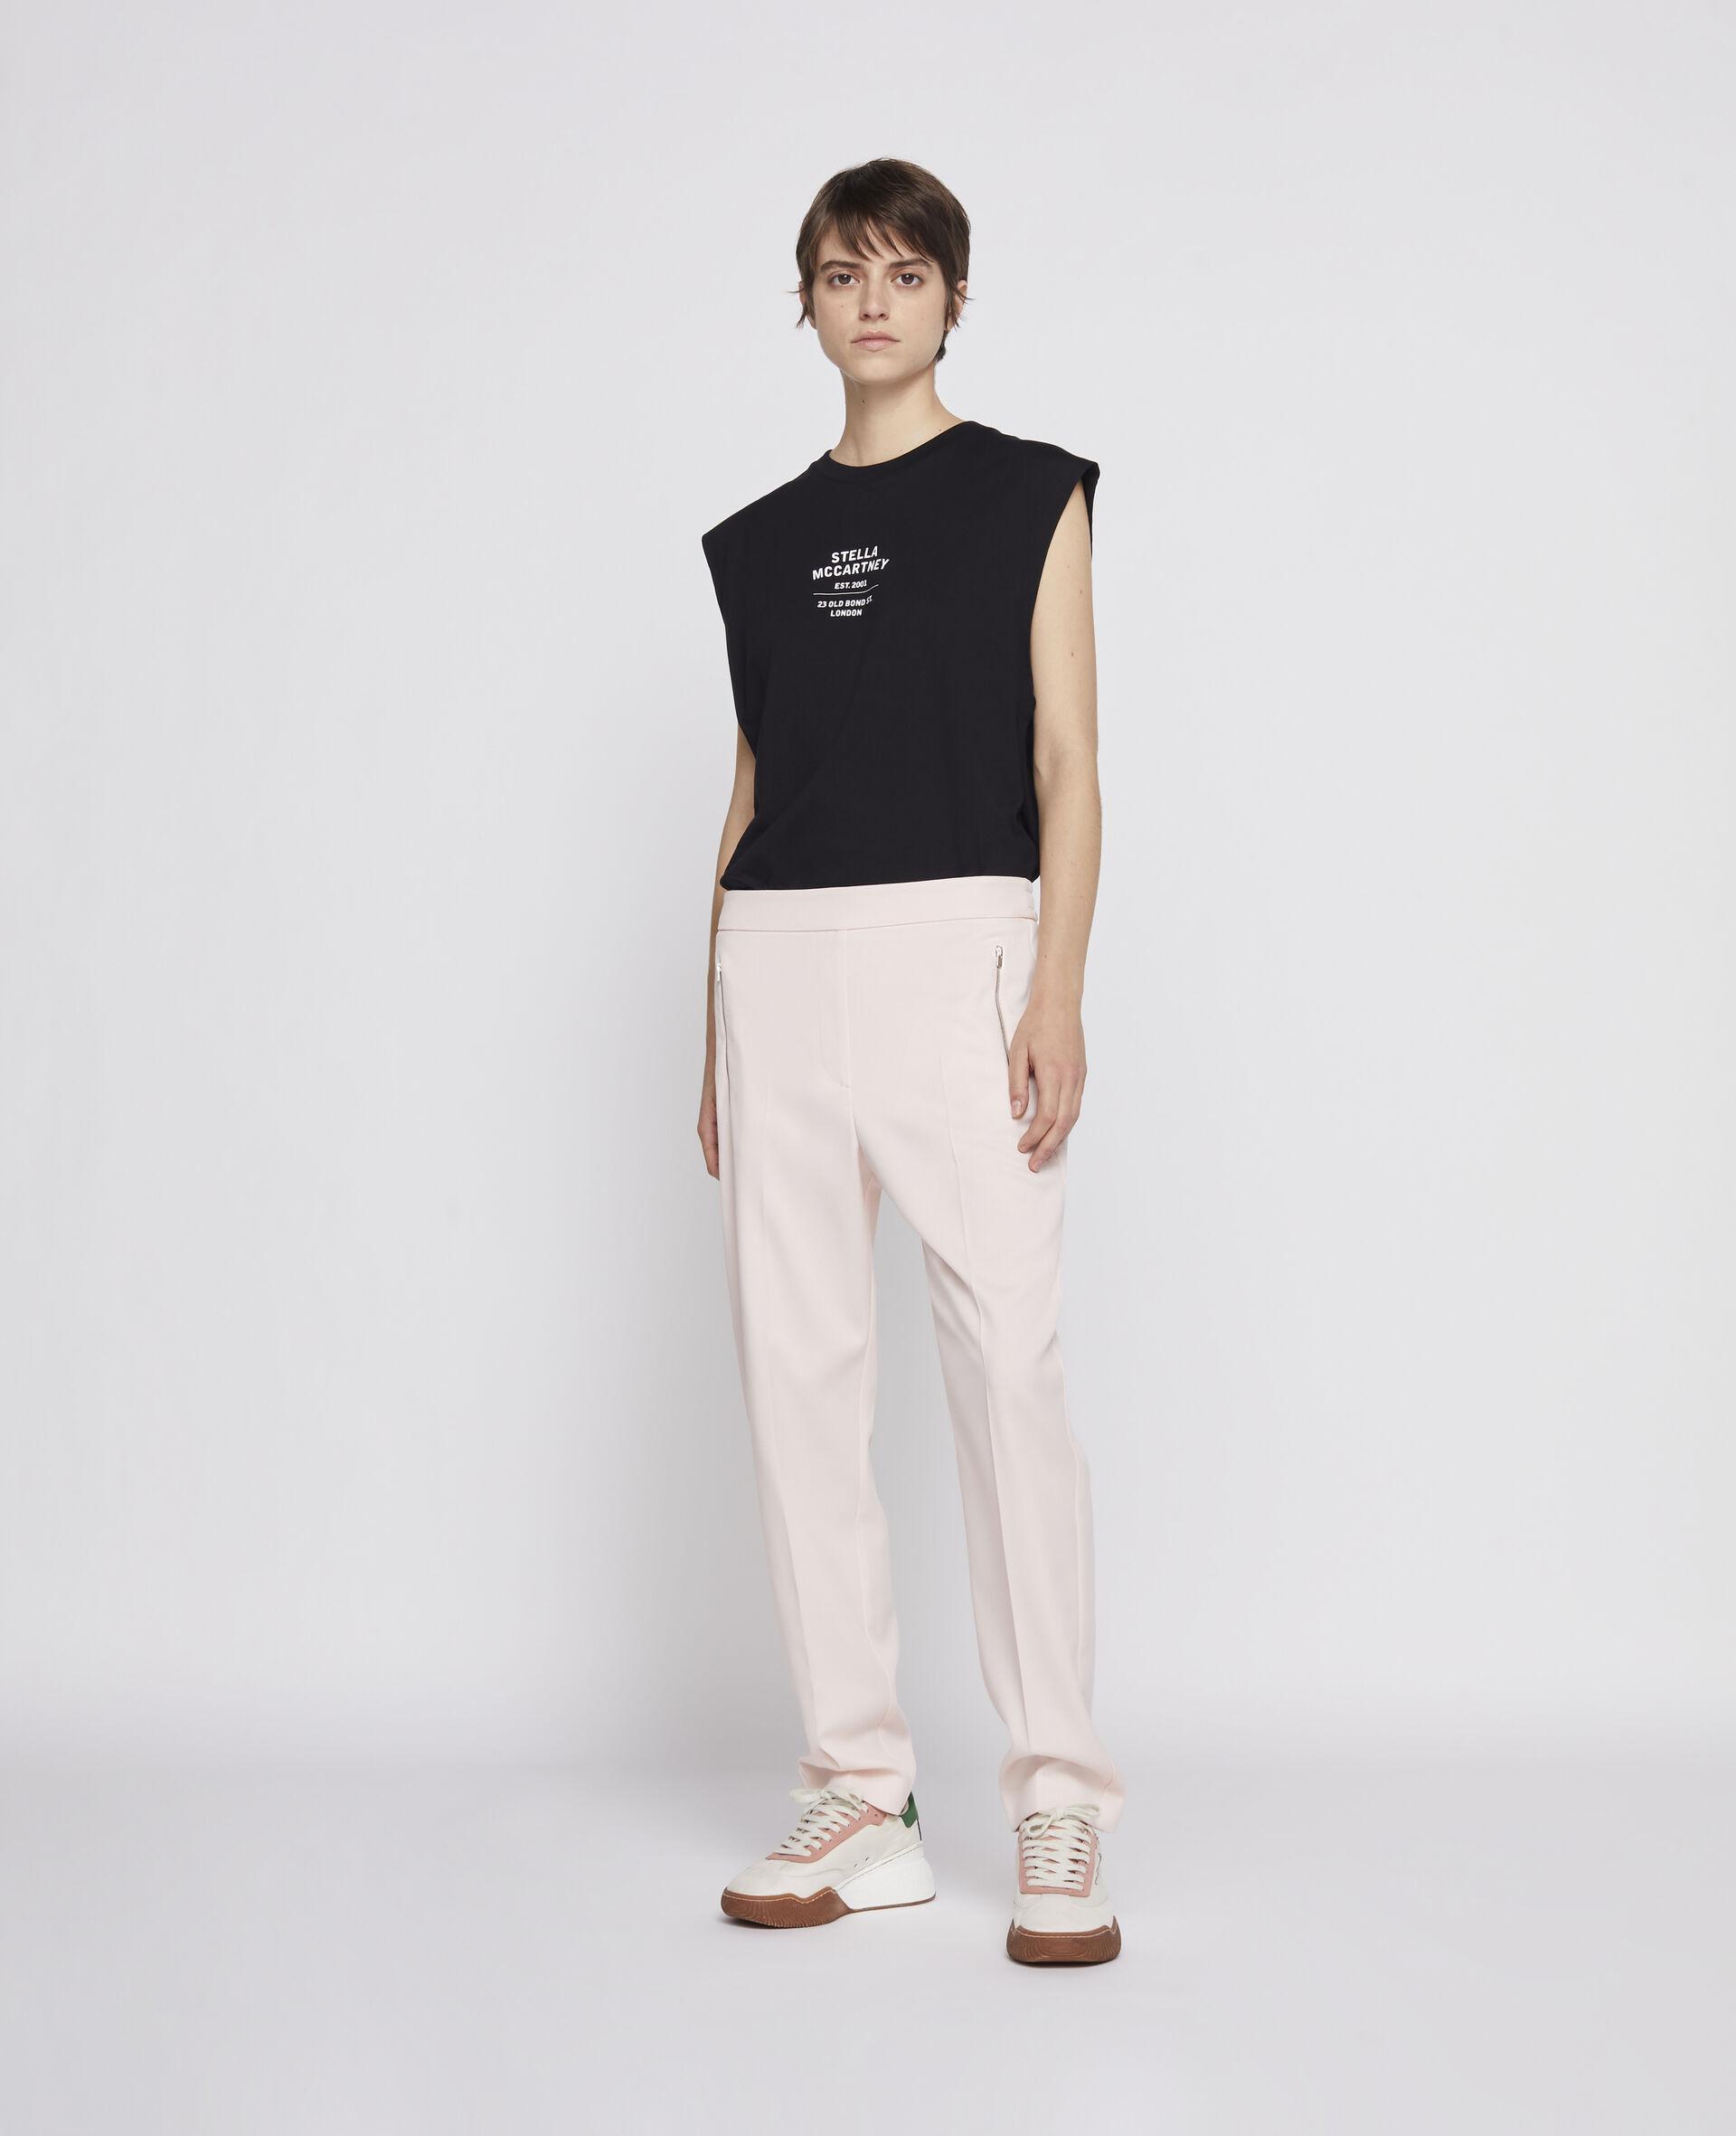 23 OBS Sleevless T-shirt-Black-large image number 3